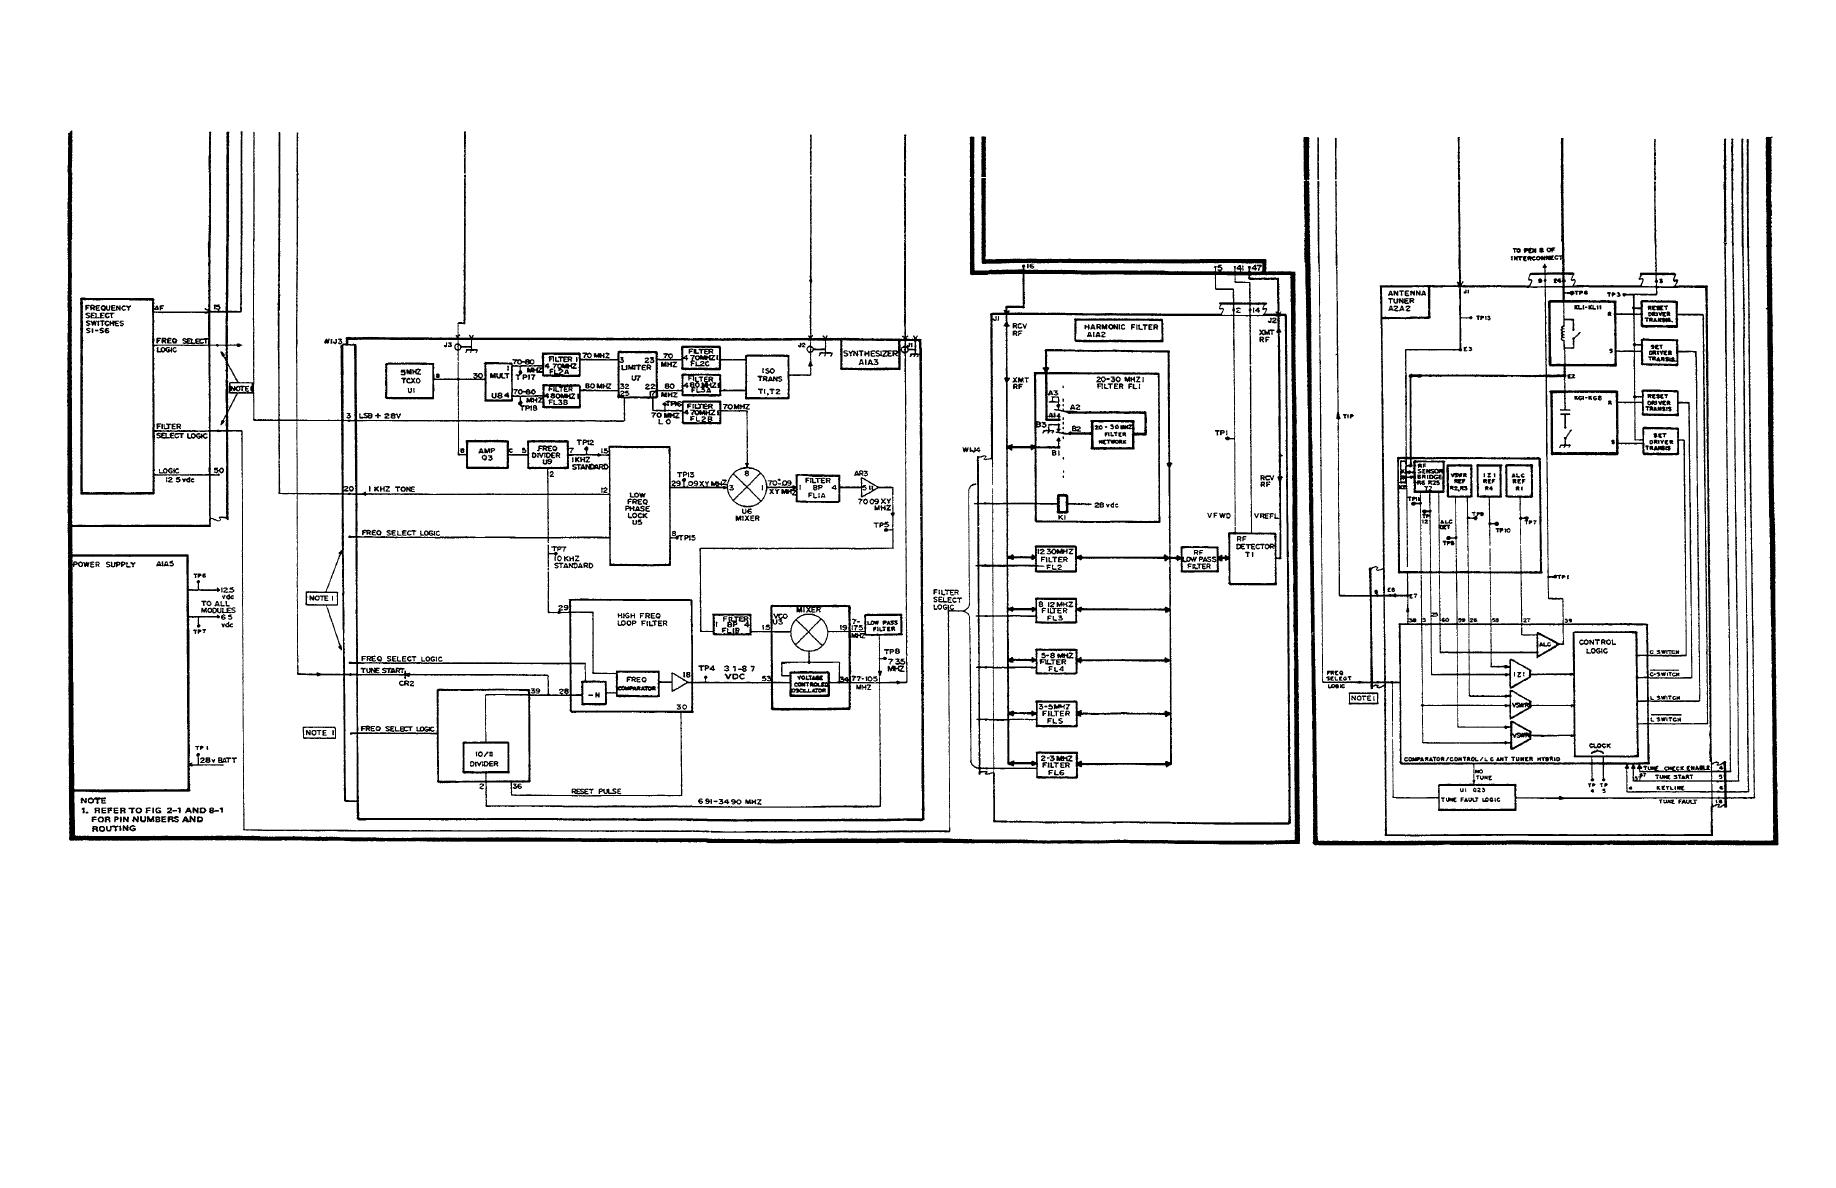 Figure 1-1. Radio Set Block Diagram (Sheet 2 of 2)